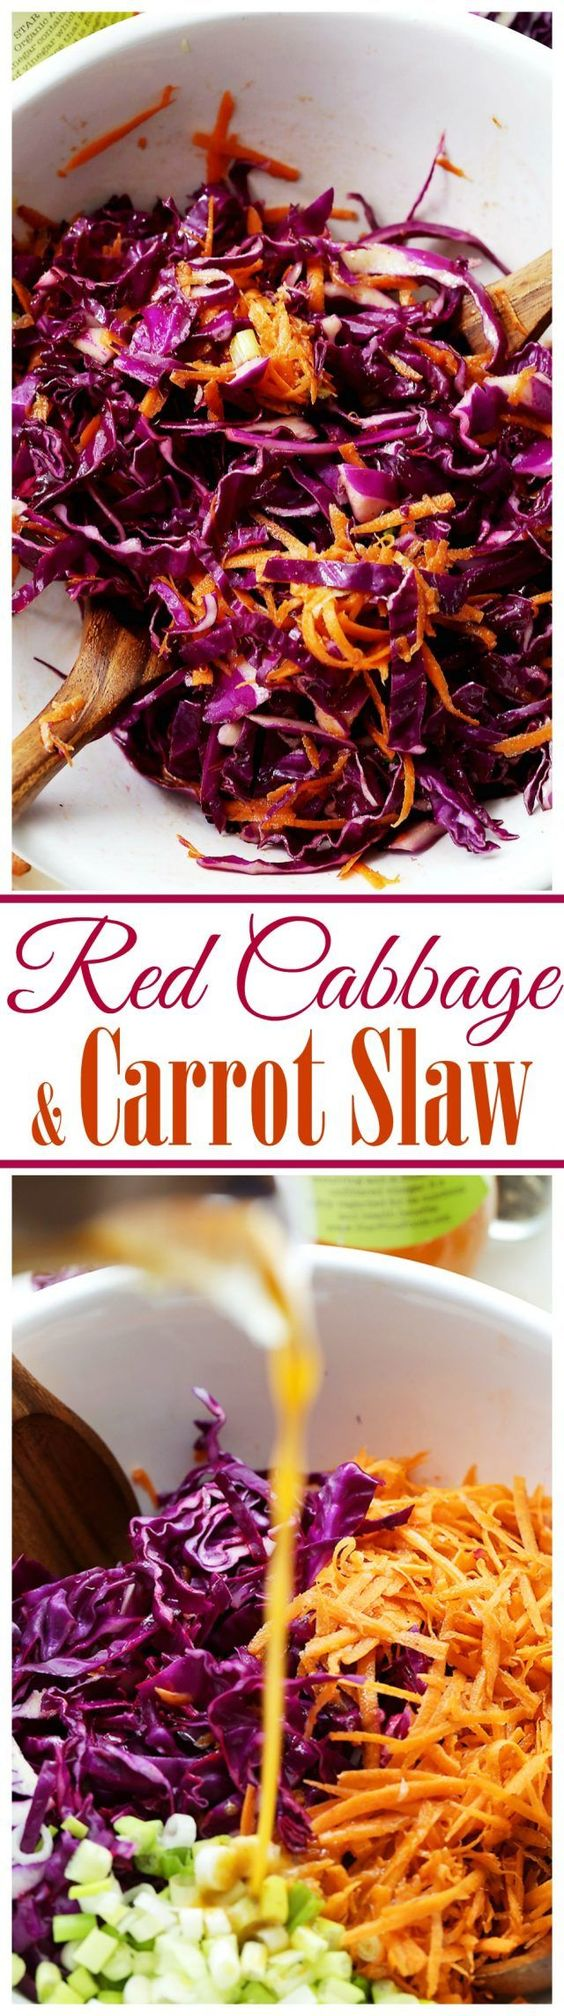 recipe slaw recipes vanilla red cabbage vinaigrette dishes carrot slaw ...